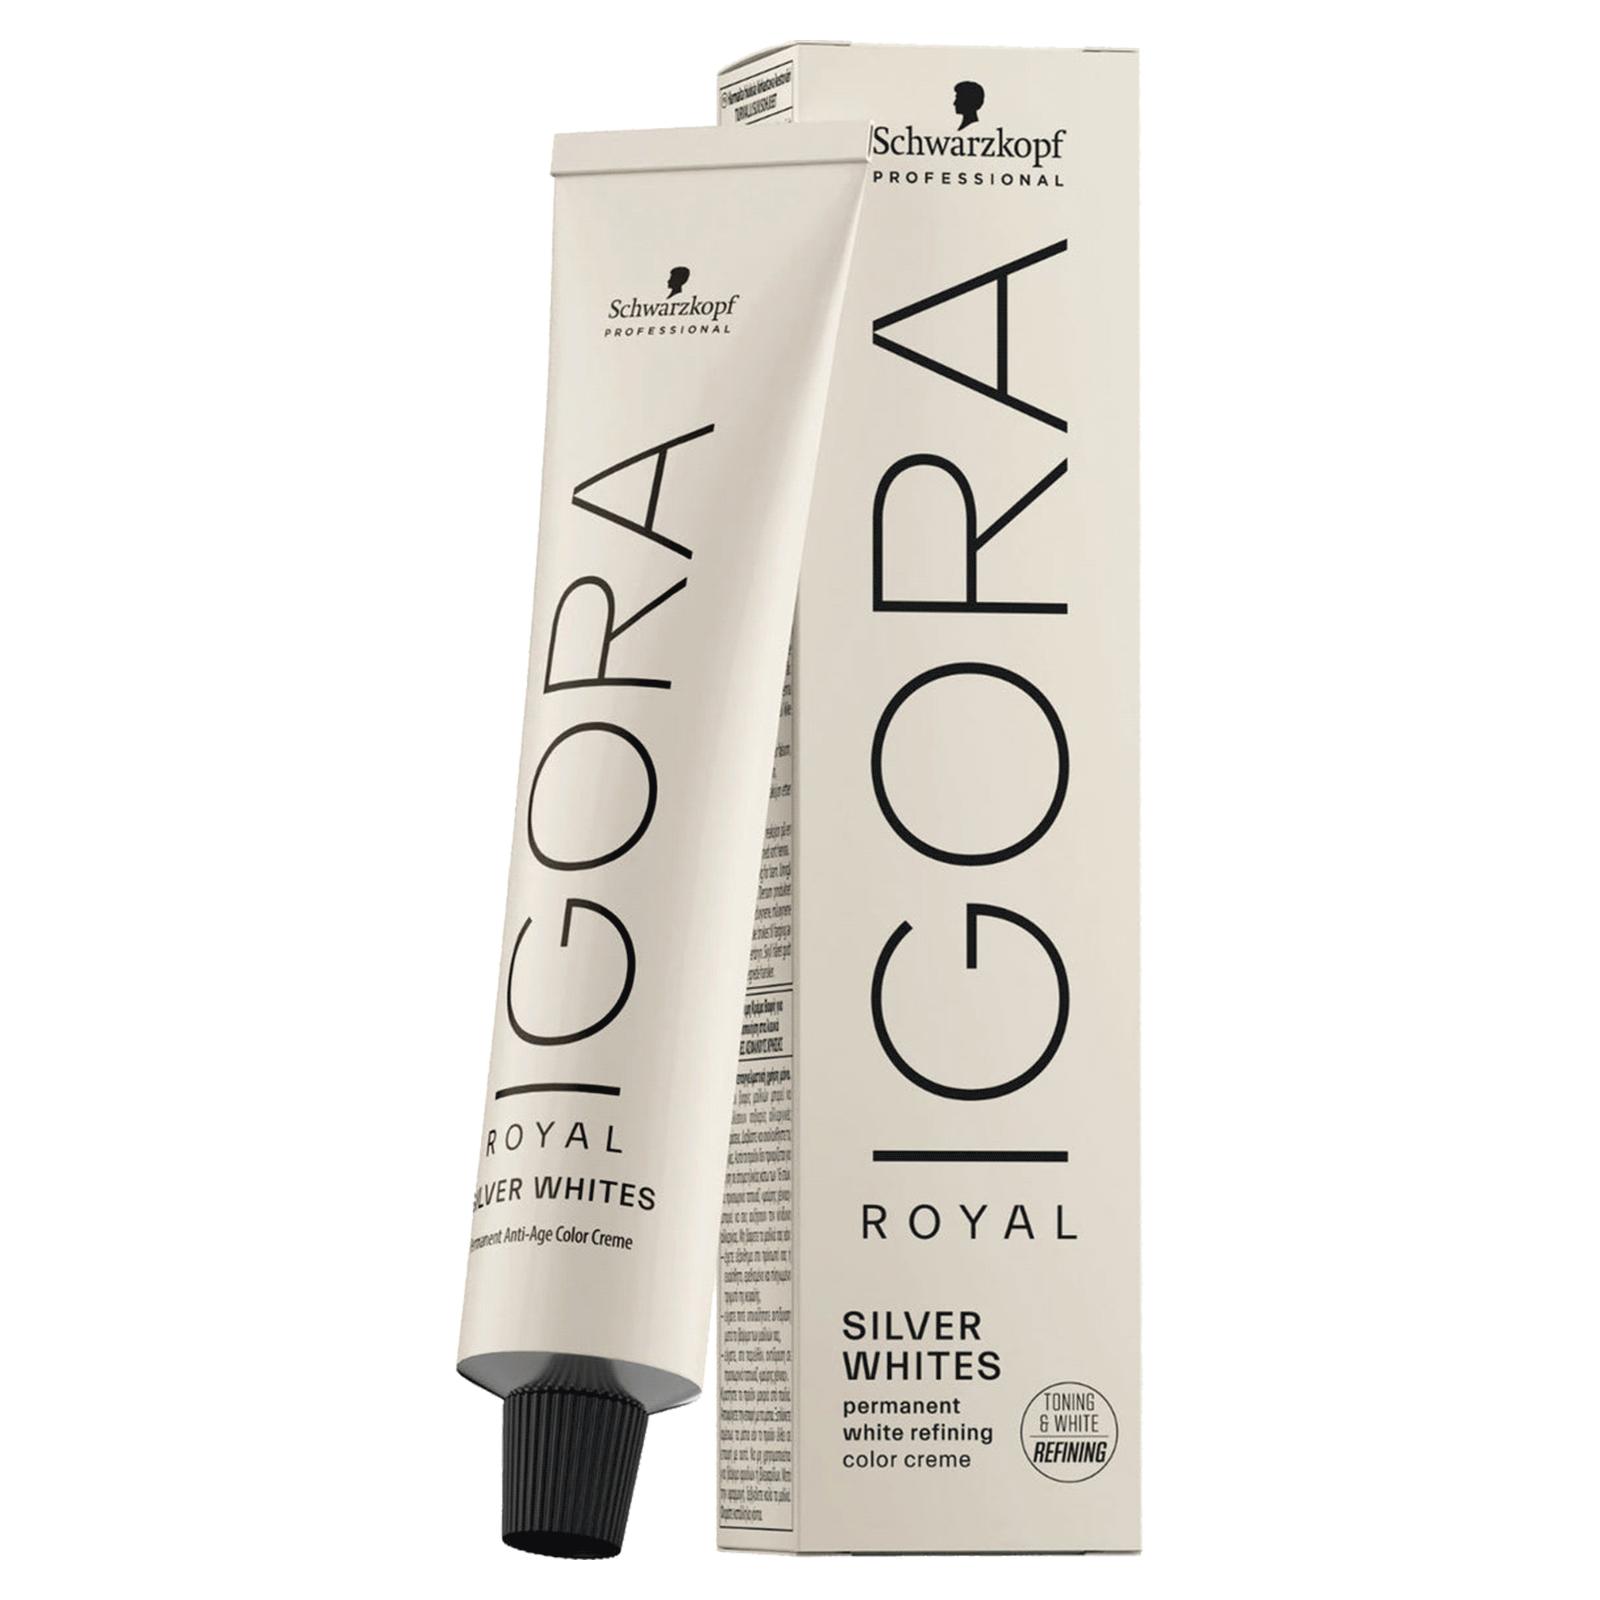 22bcf9923d IGORA Royal Silverwhite - Schwarzkopf Professional | CosmoProf